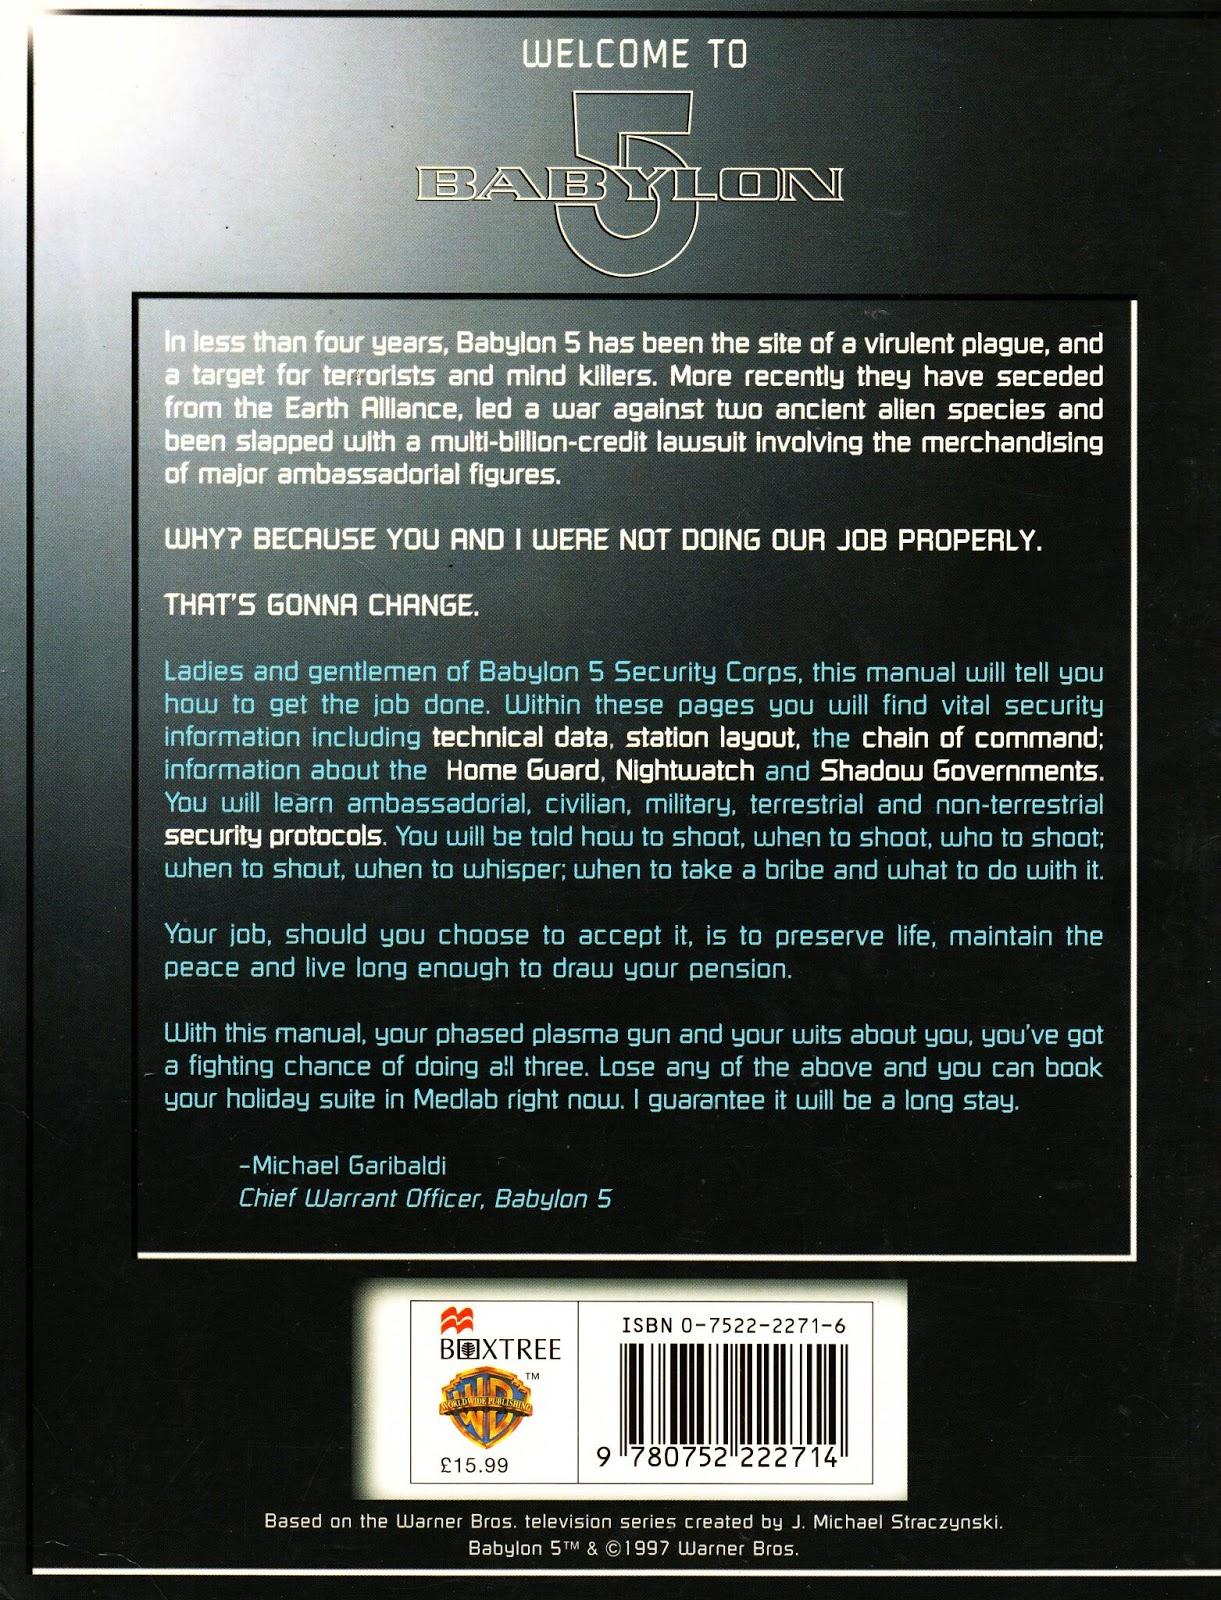 Babylon 5 Security Manual